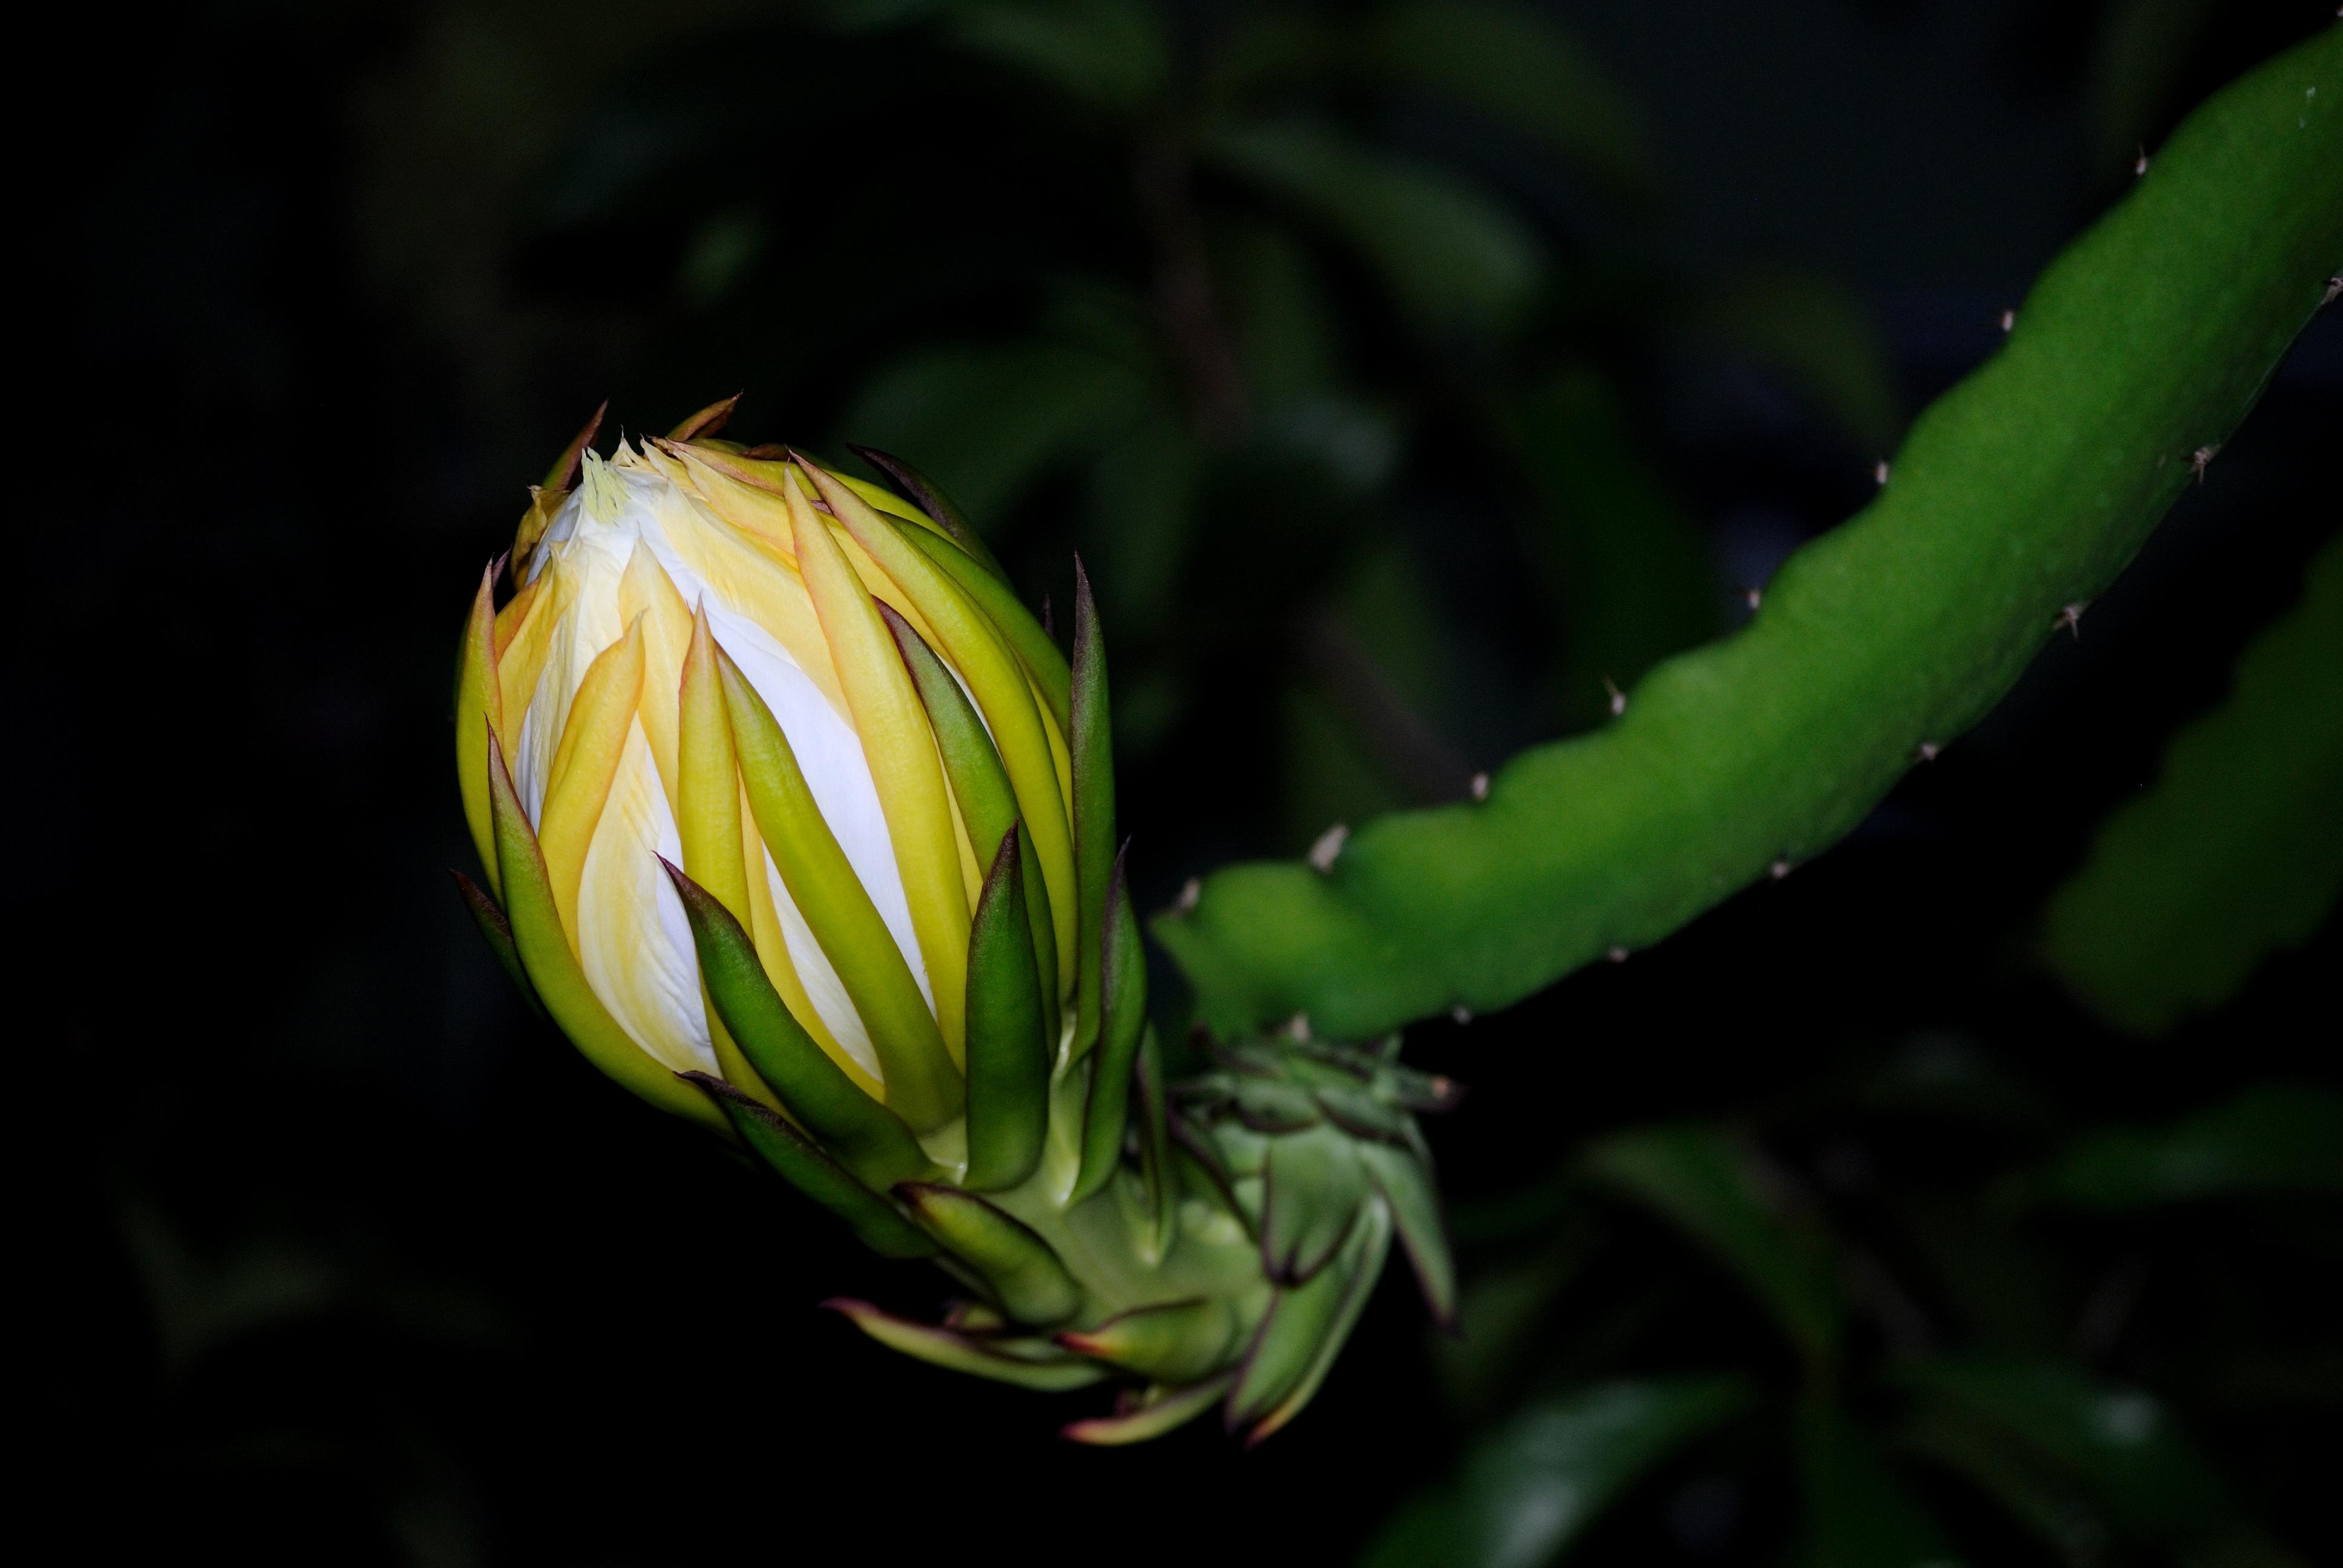 File:Bunga buah naga.jpg